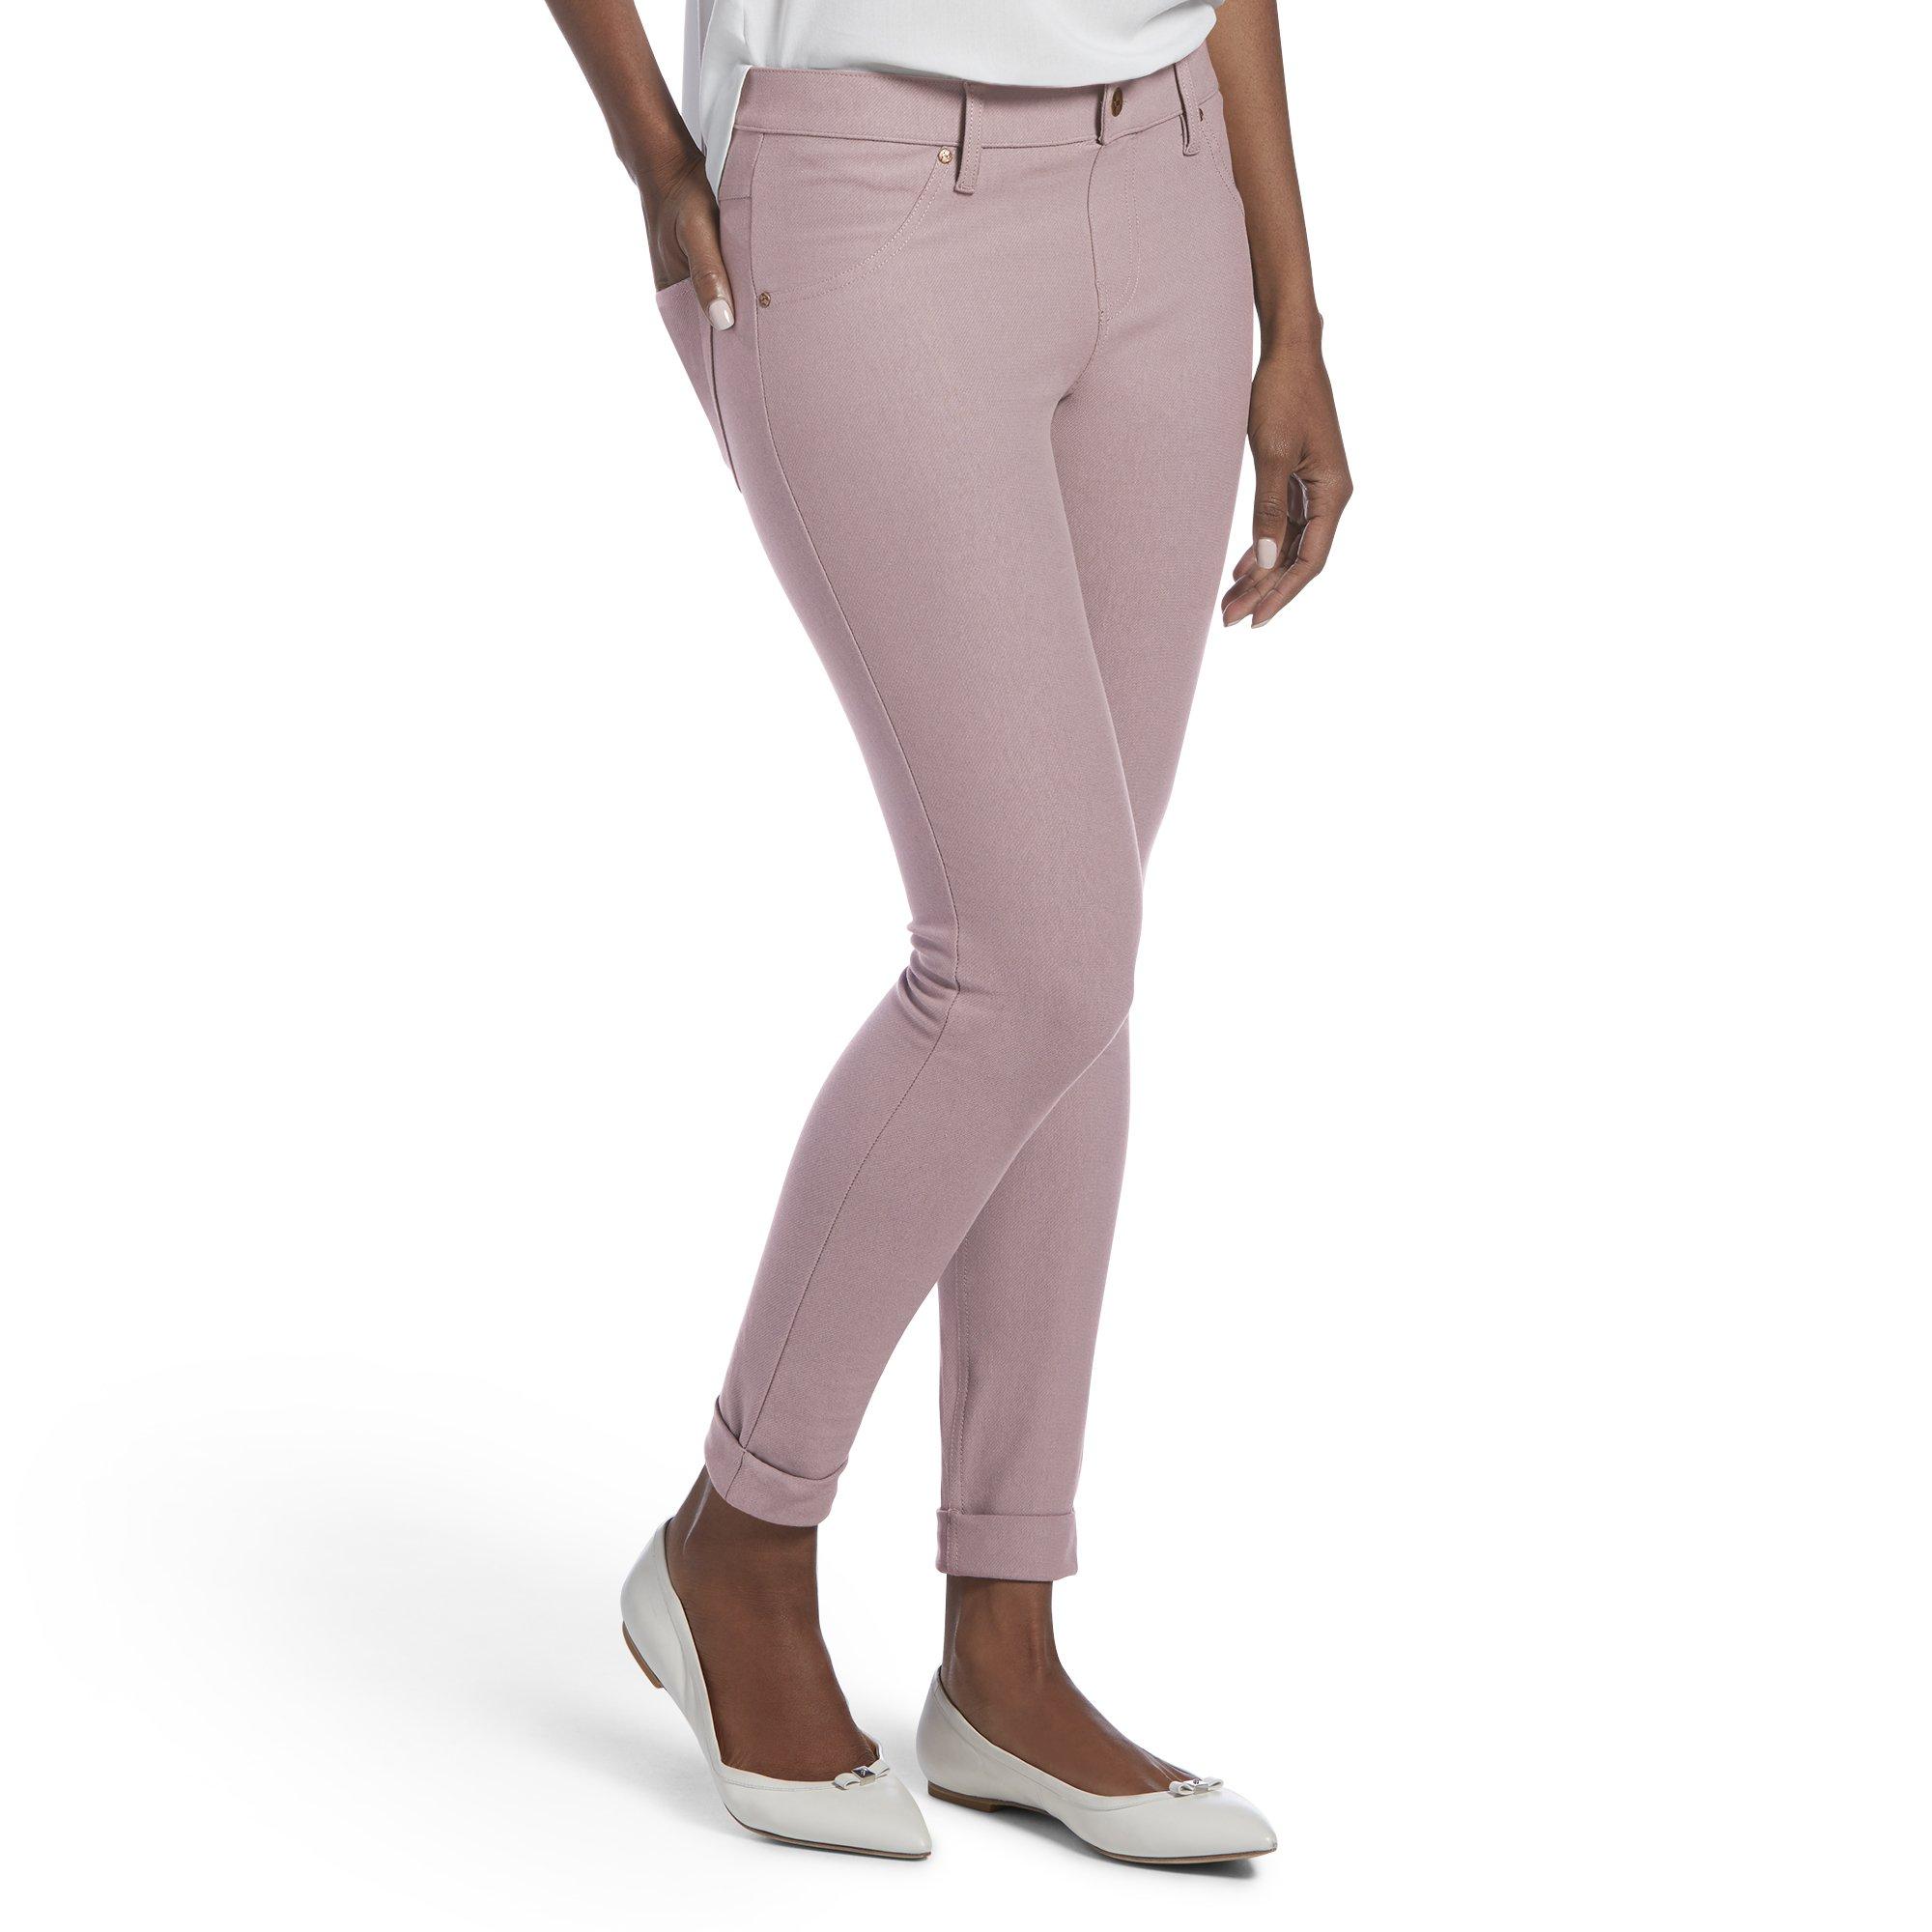 HUE Women's Essential Denim Skimmer Leggings, Cuffed Hem-Vintage Pink, M